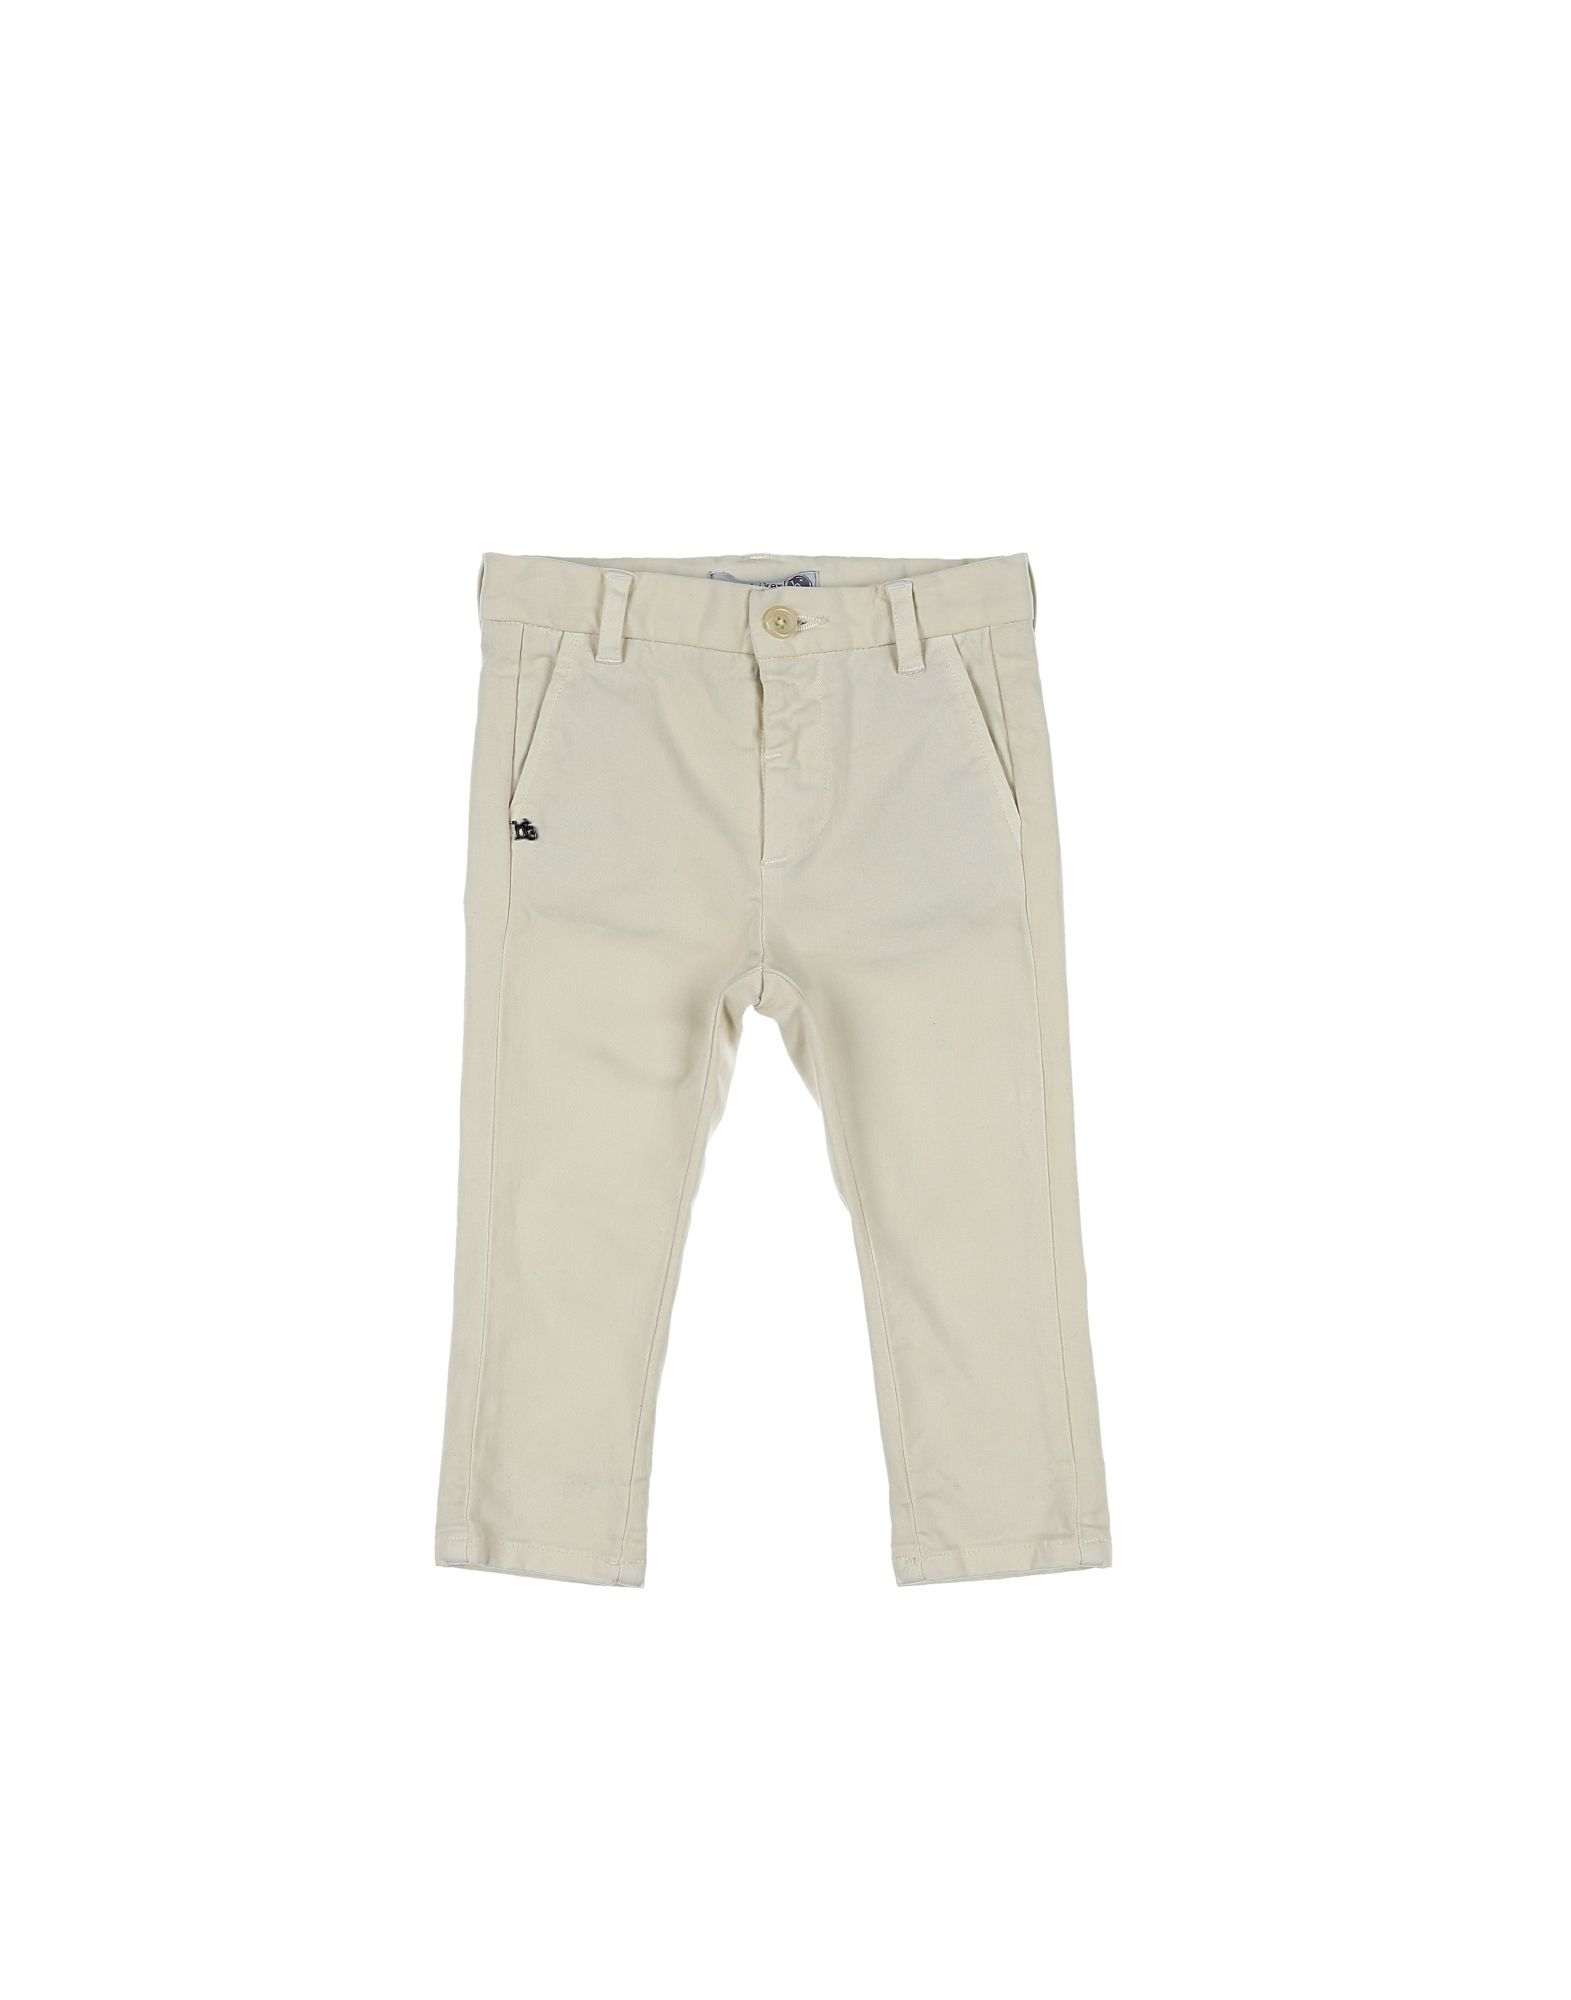 HITCH-HIKER Повседневные брюки hiker trekking